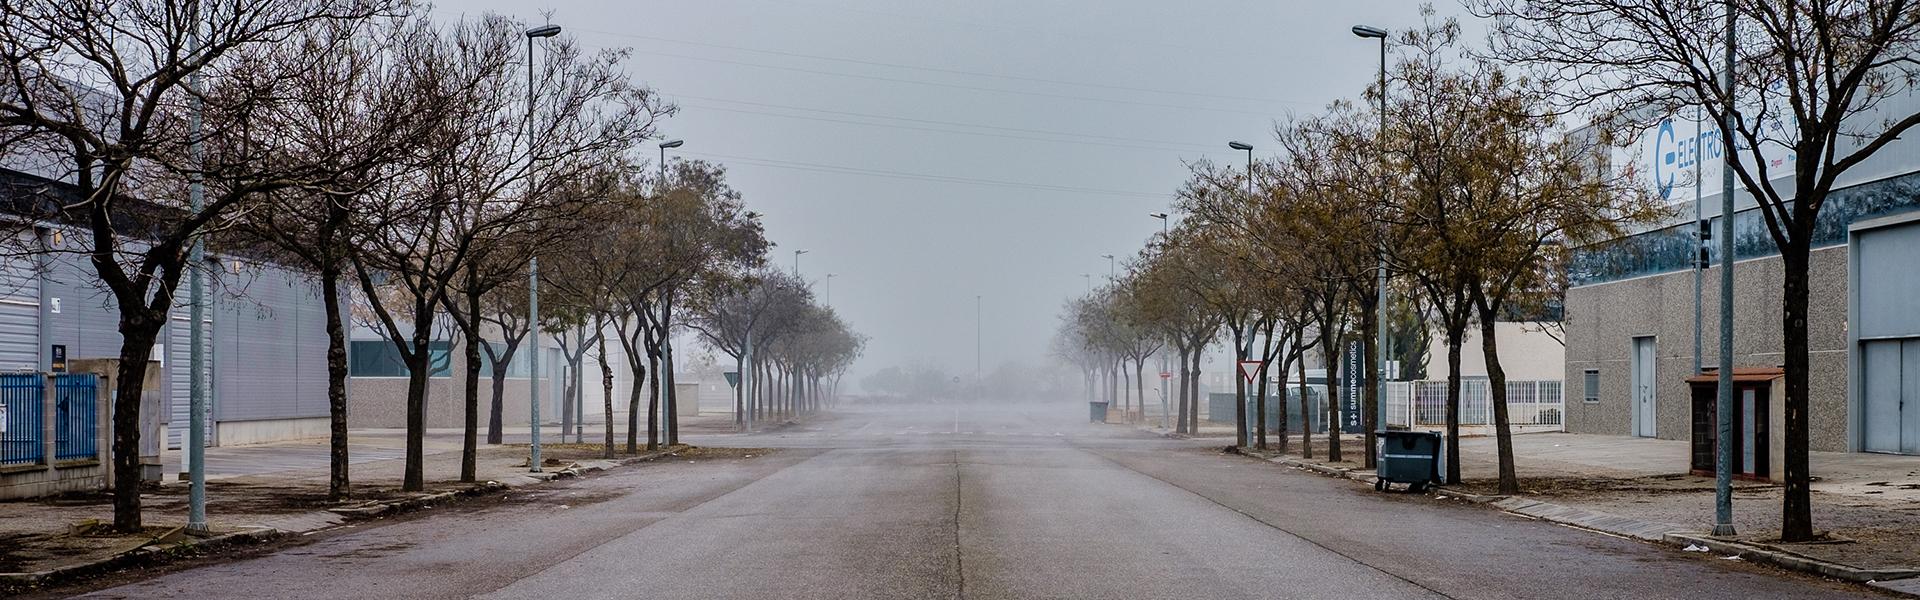 Foto: Javier Lebrero